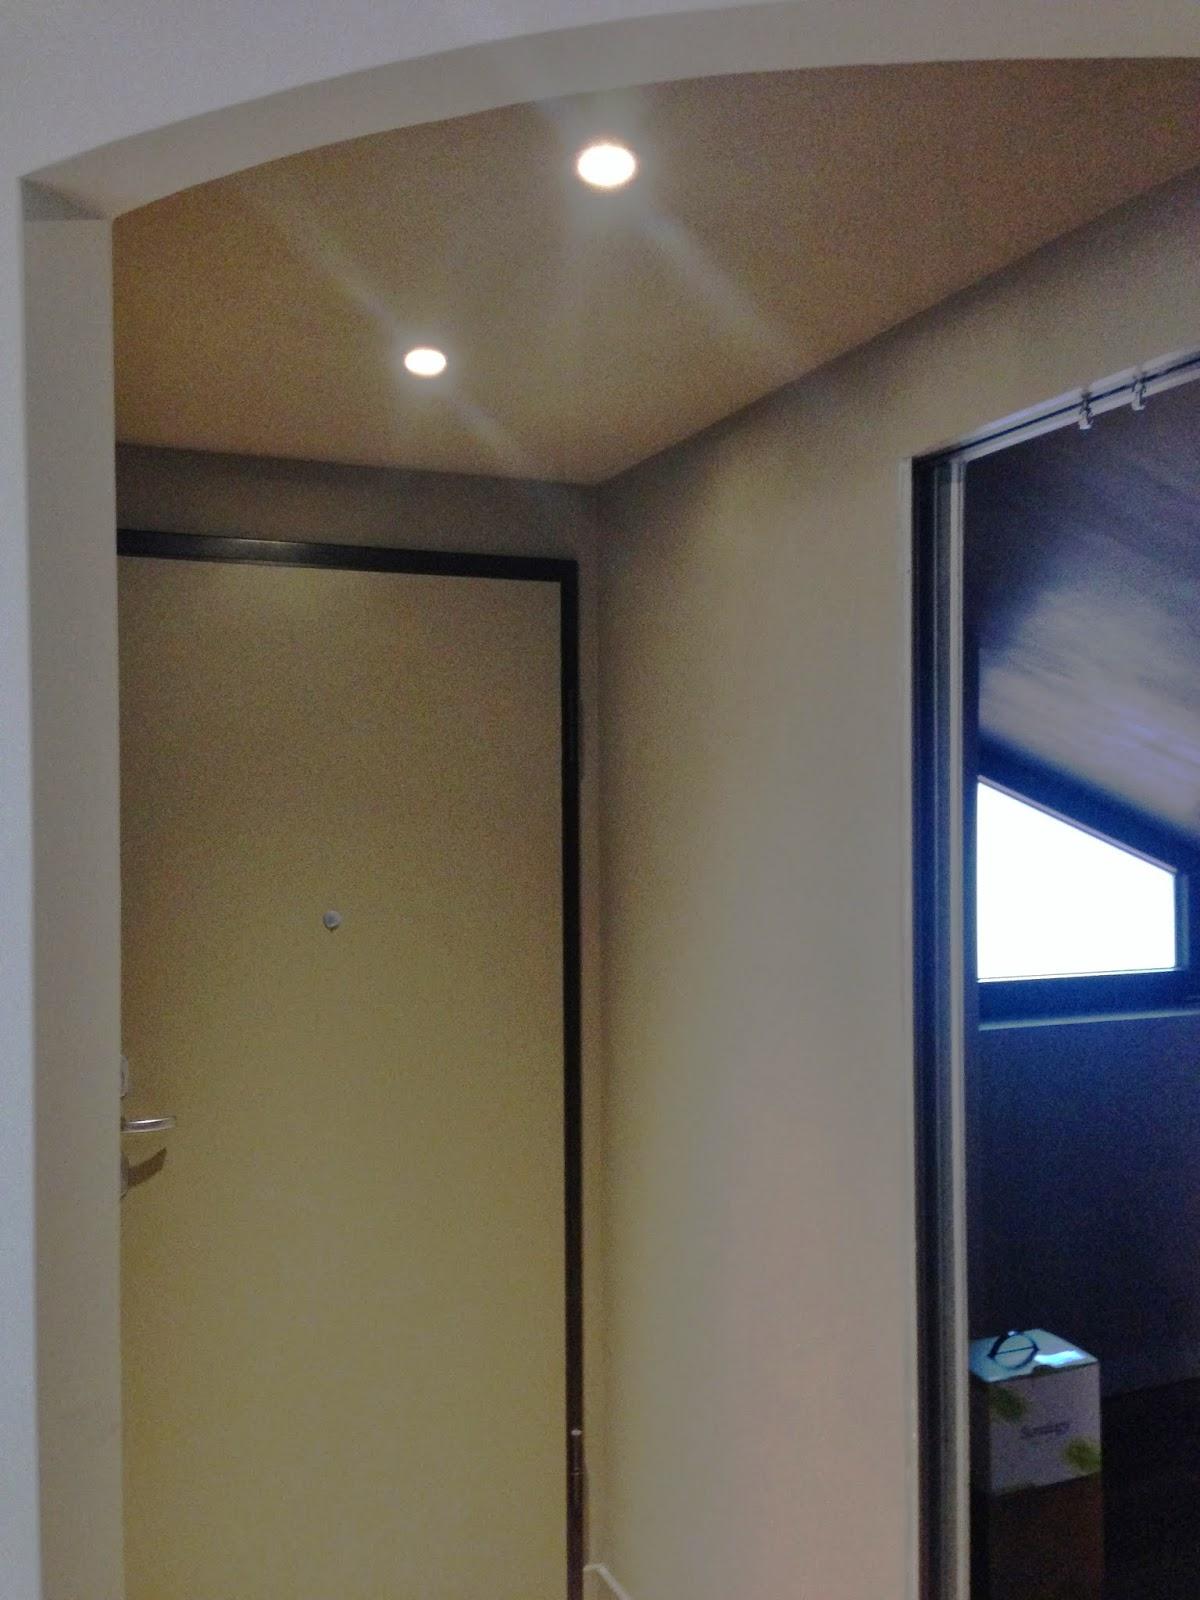 Illuminazione Led casa: Illuminazione Led Casa – Lelide Led Torino presenta Torino ...